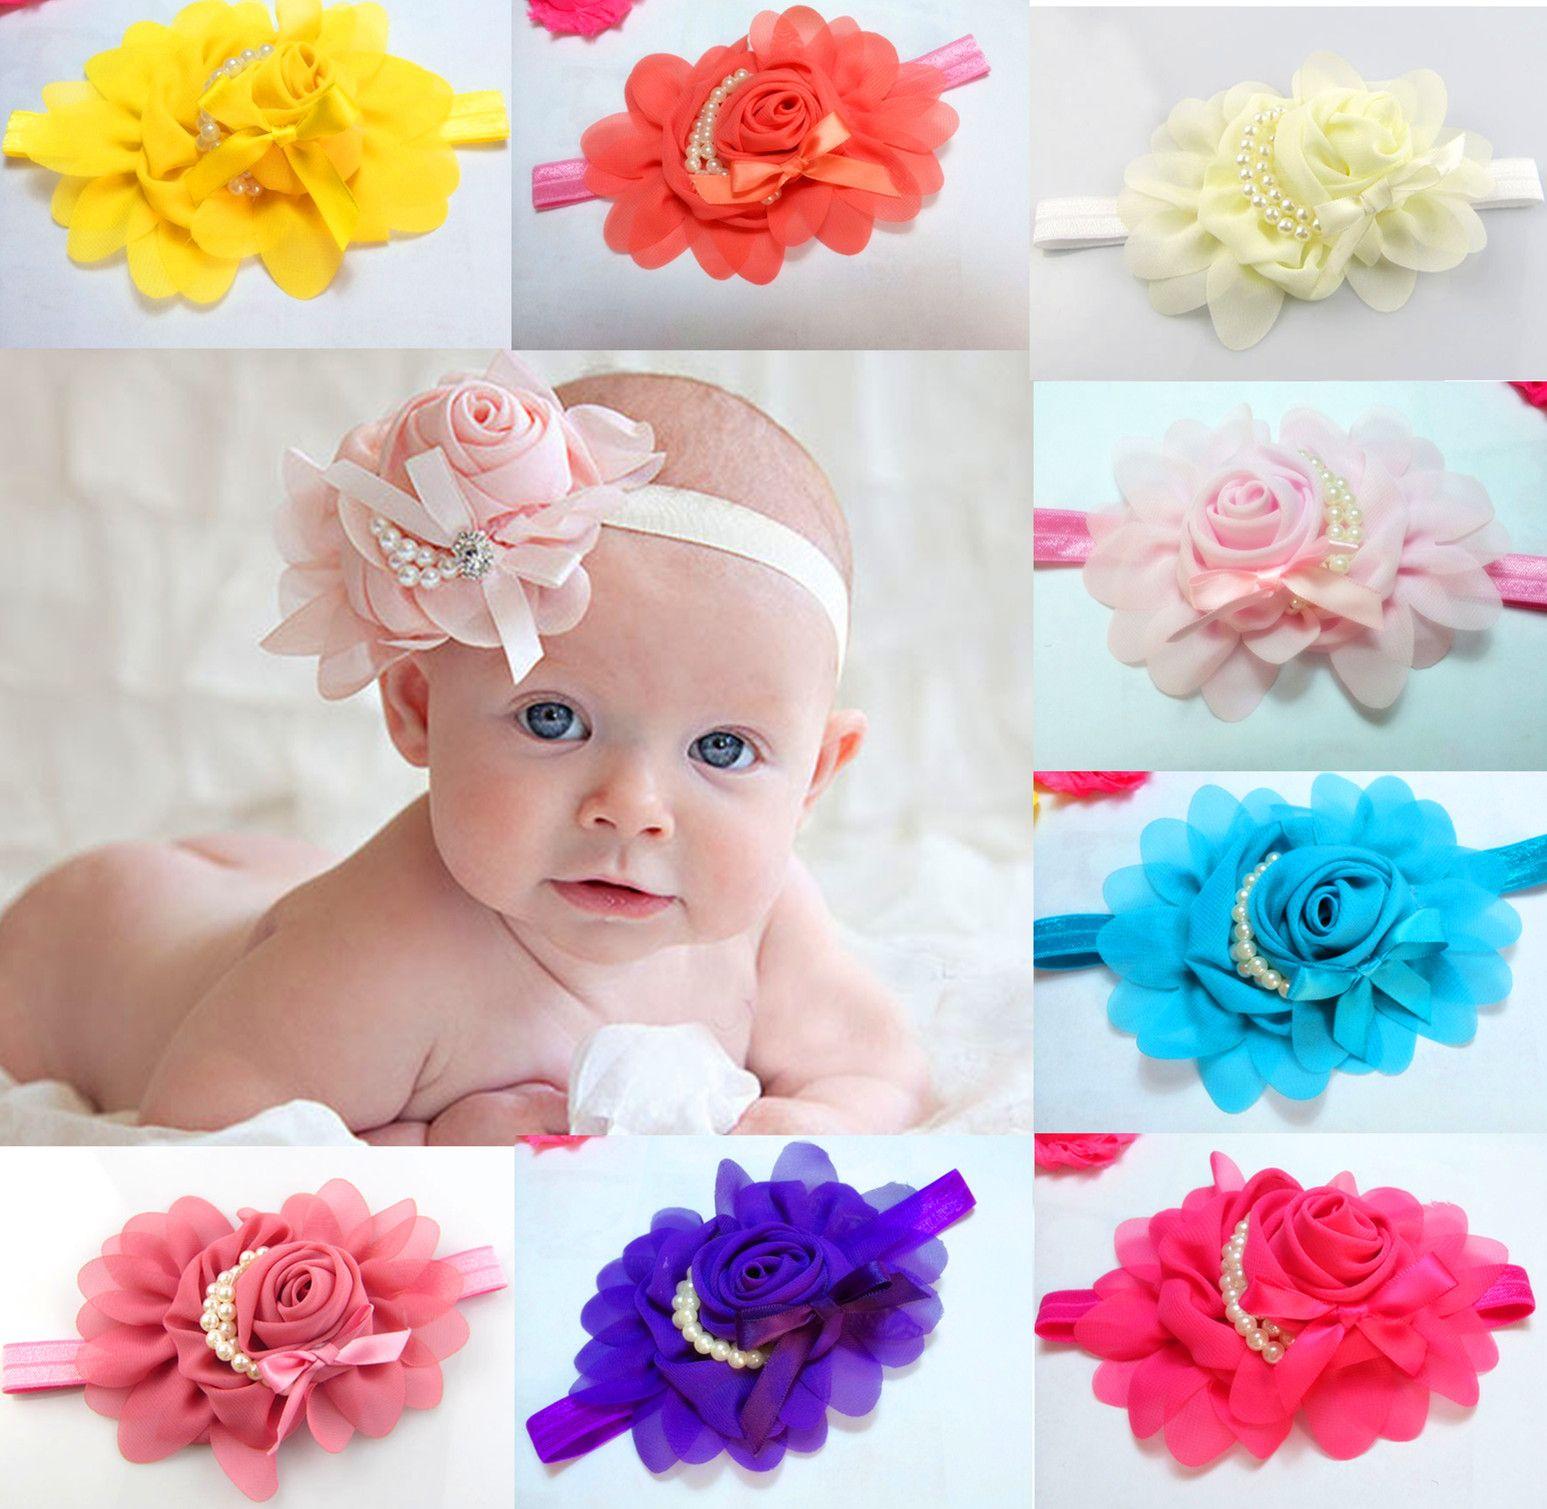 Zara baby hair accessories - Baby Hair Accessories Wholesale India Baby Headband Accessories Wholesale